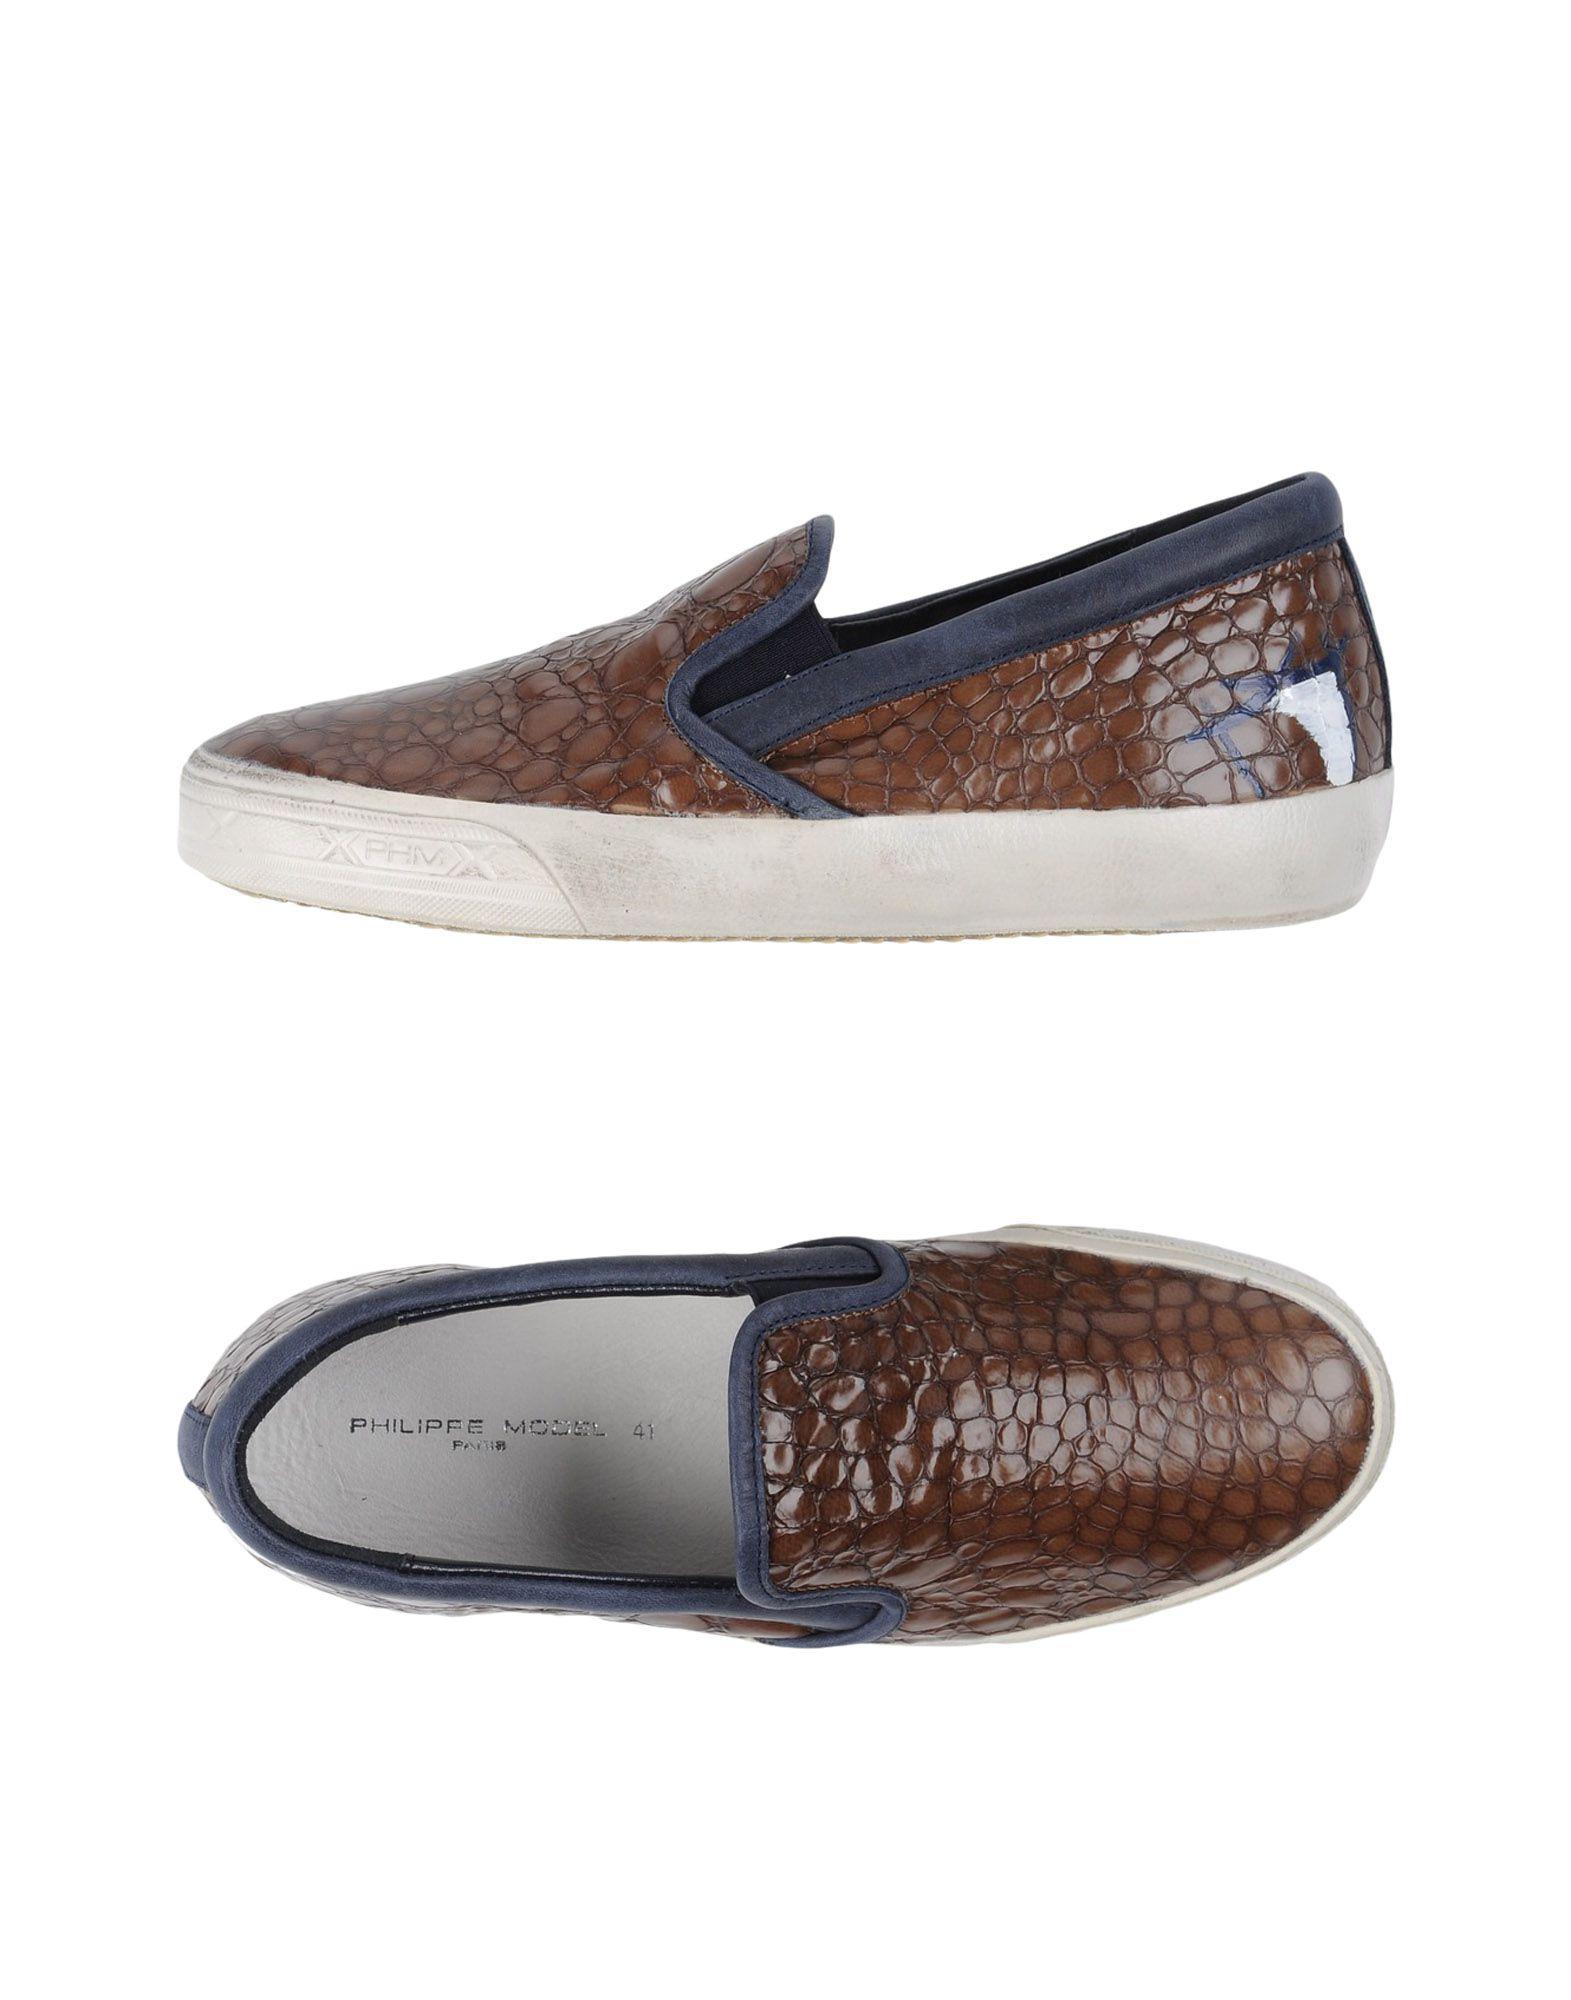 PHILIPPE MODEL Herren Low Sneakers & Tennisschuhe Farbe Dunkelbraun Größe 9 - broschei